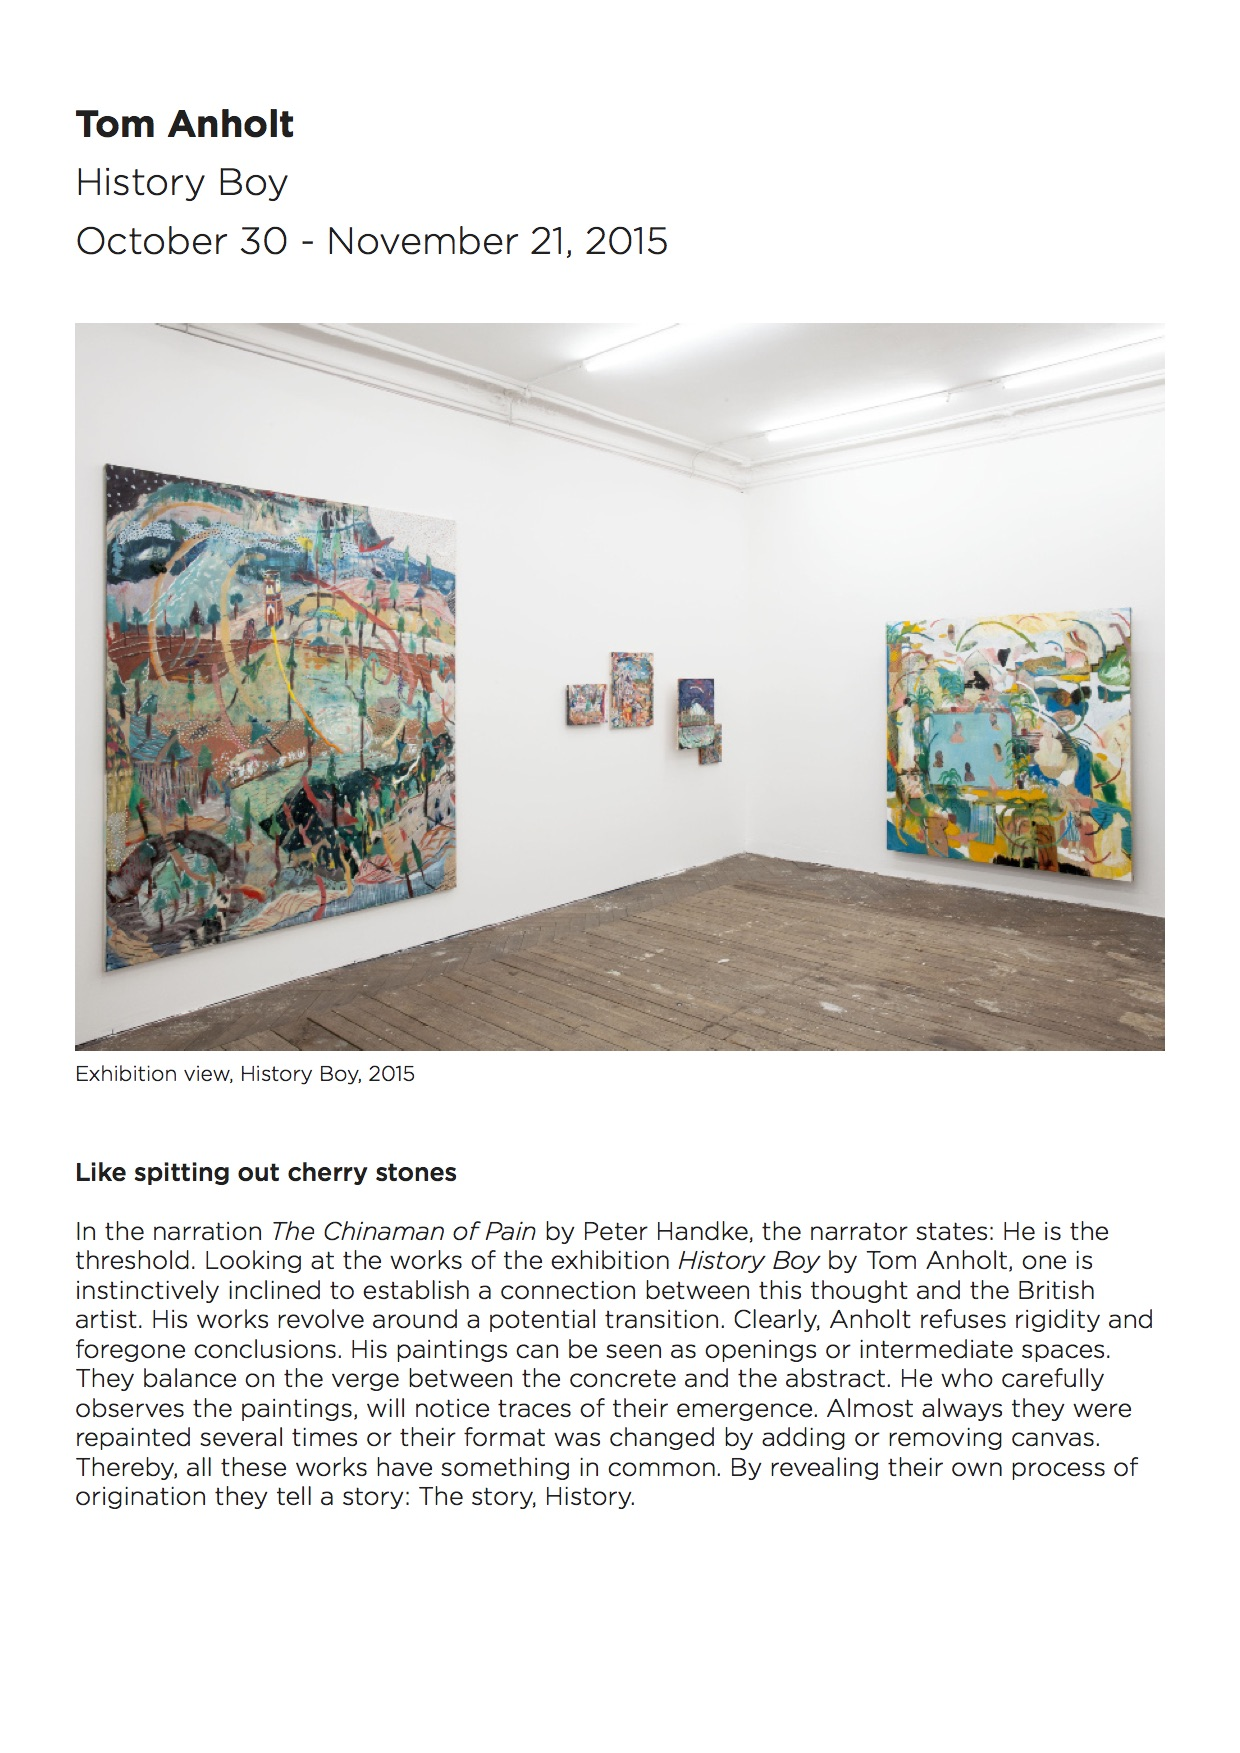 Eigen+Art Press release   Tom Anholt   History Boy 2015